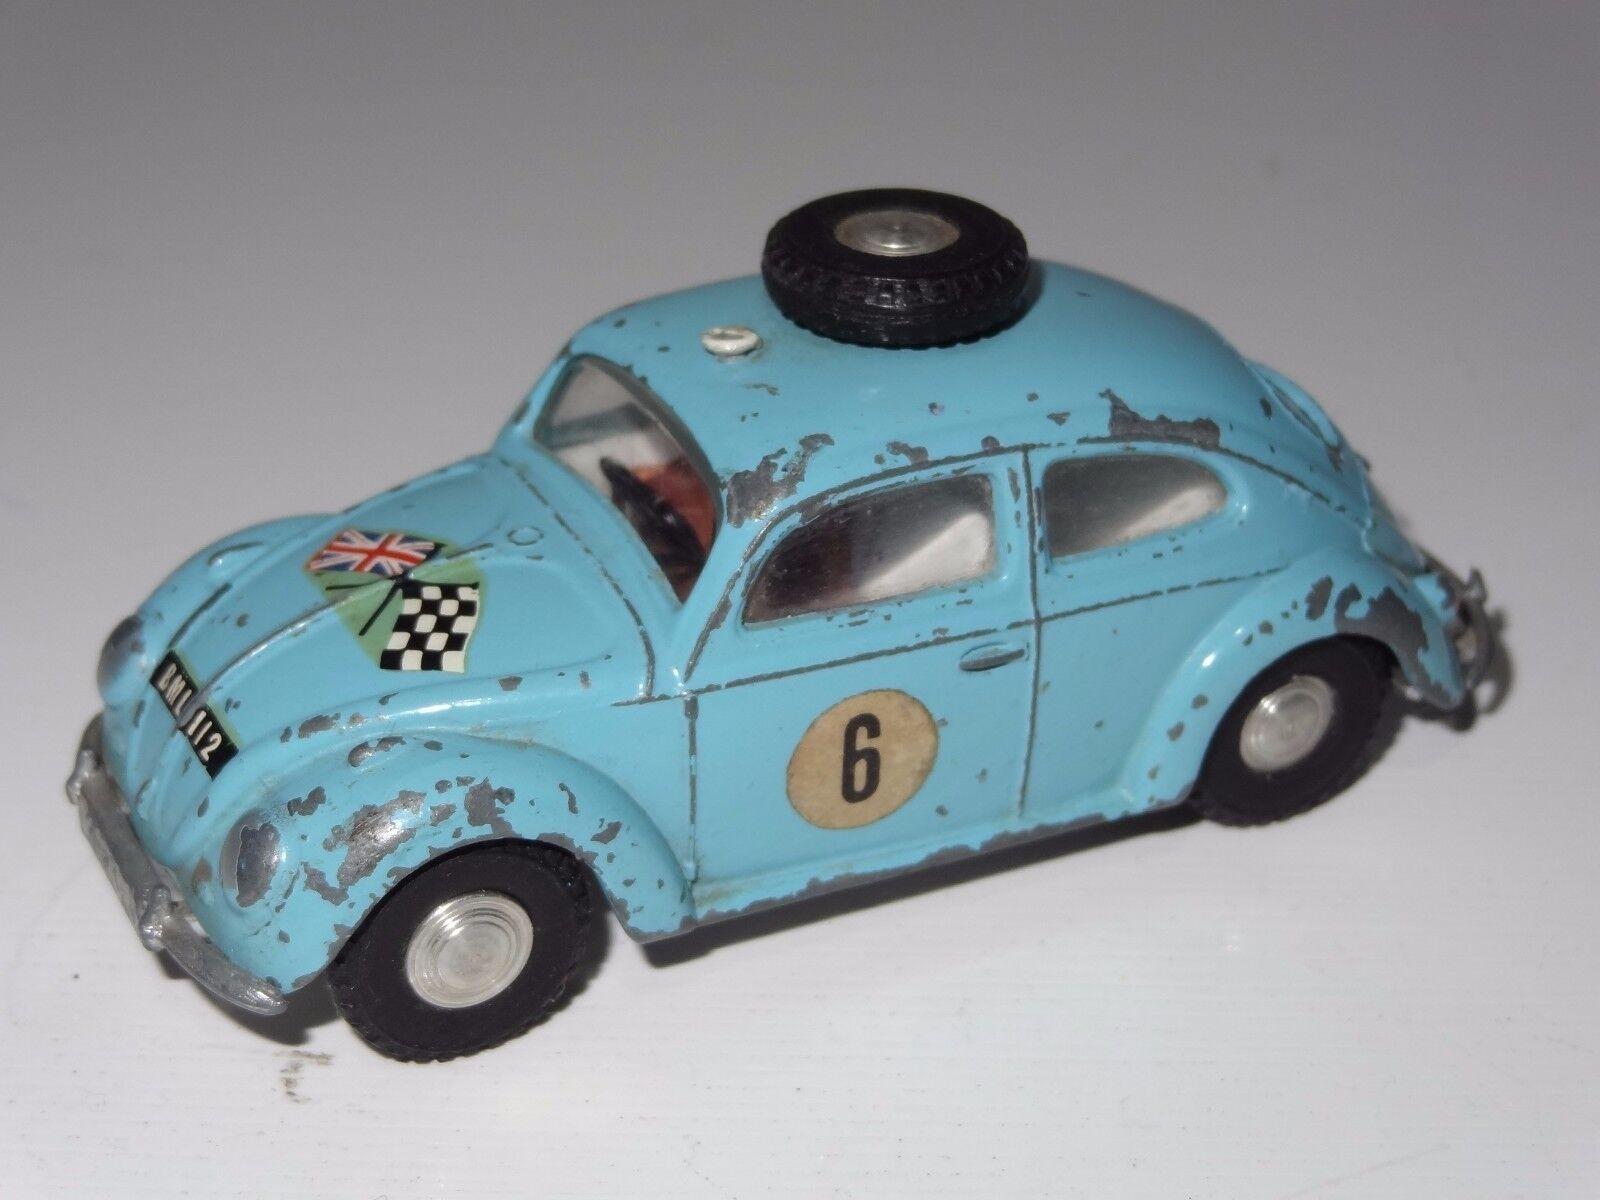 Triang spot on VW VW VW VOLKSWAGEN BEETLE RALLYE CAR - 195 e74336